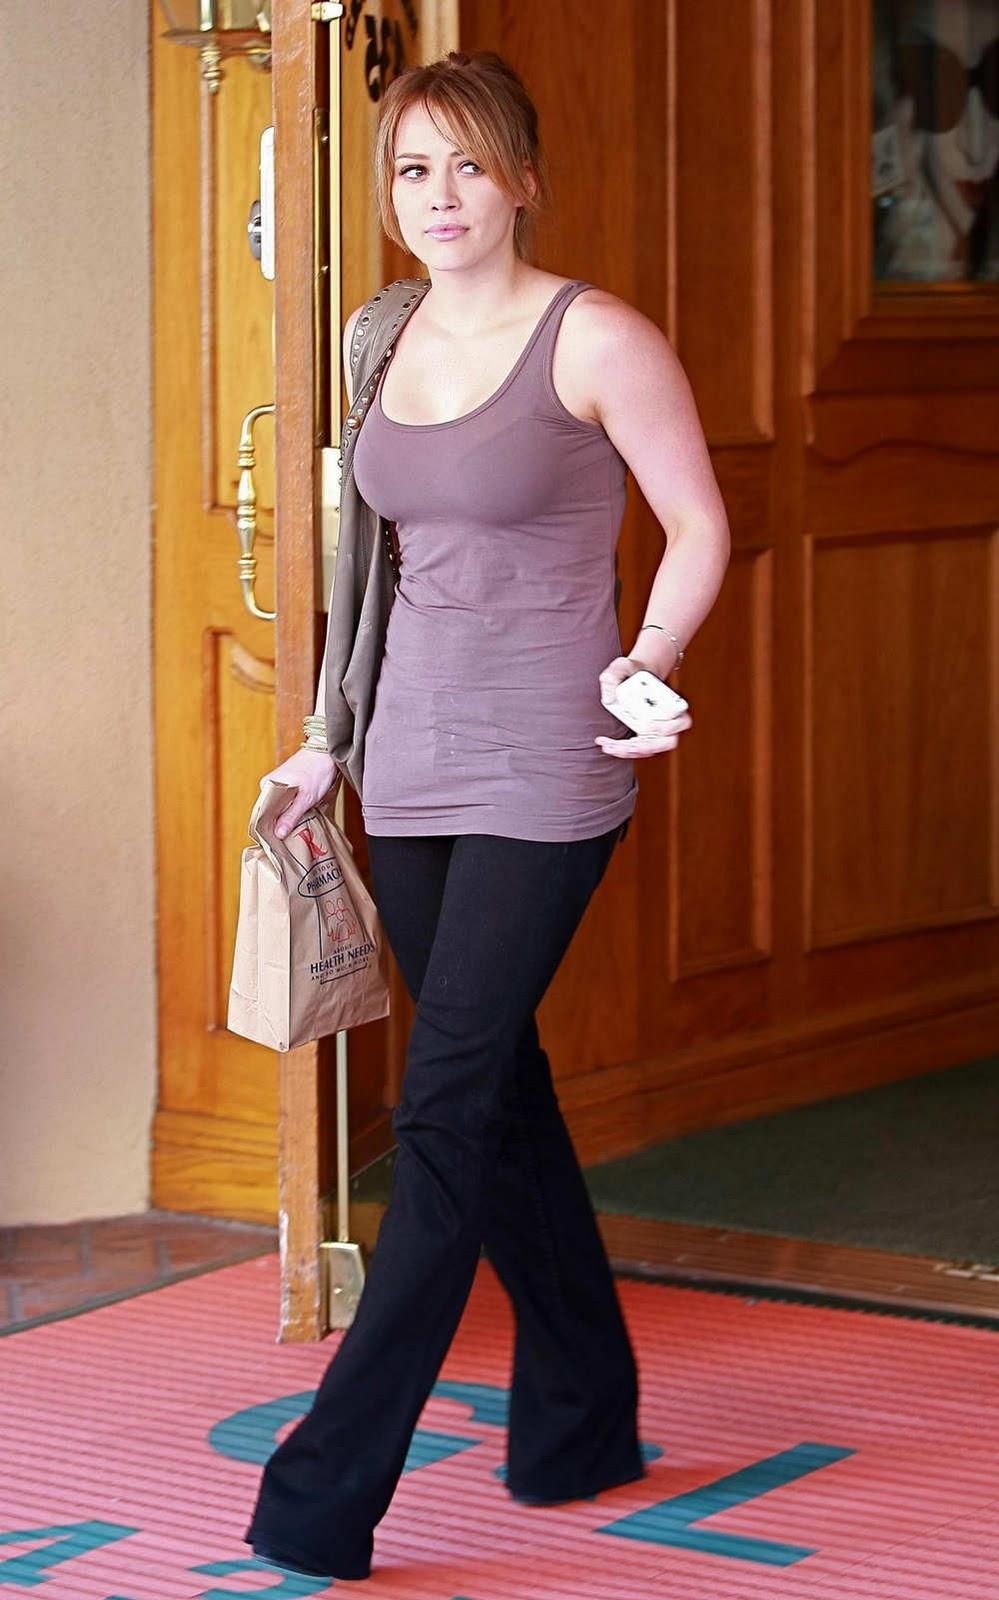 Carmen Electra - Celebrity Fashionistas - Pictures - CBS News